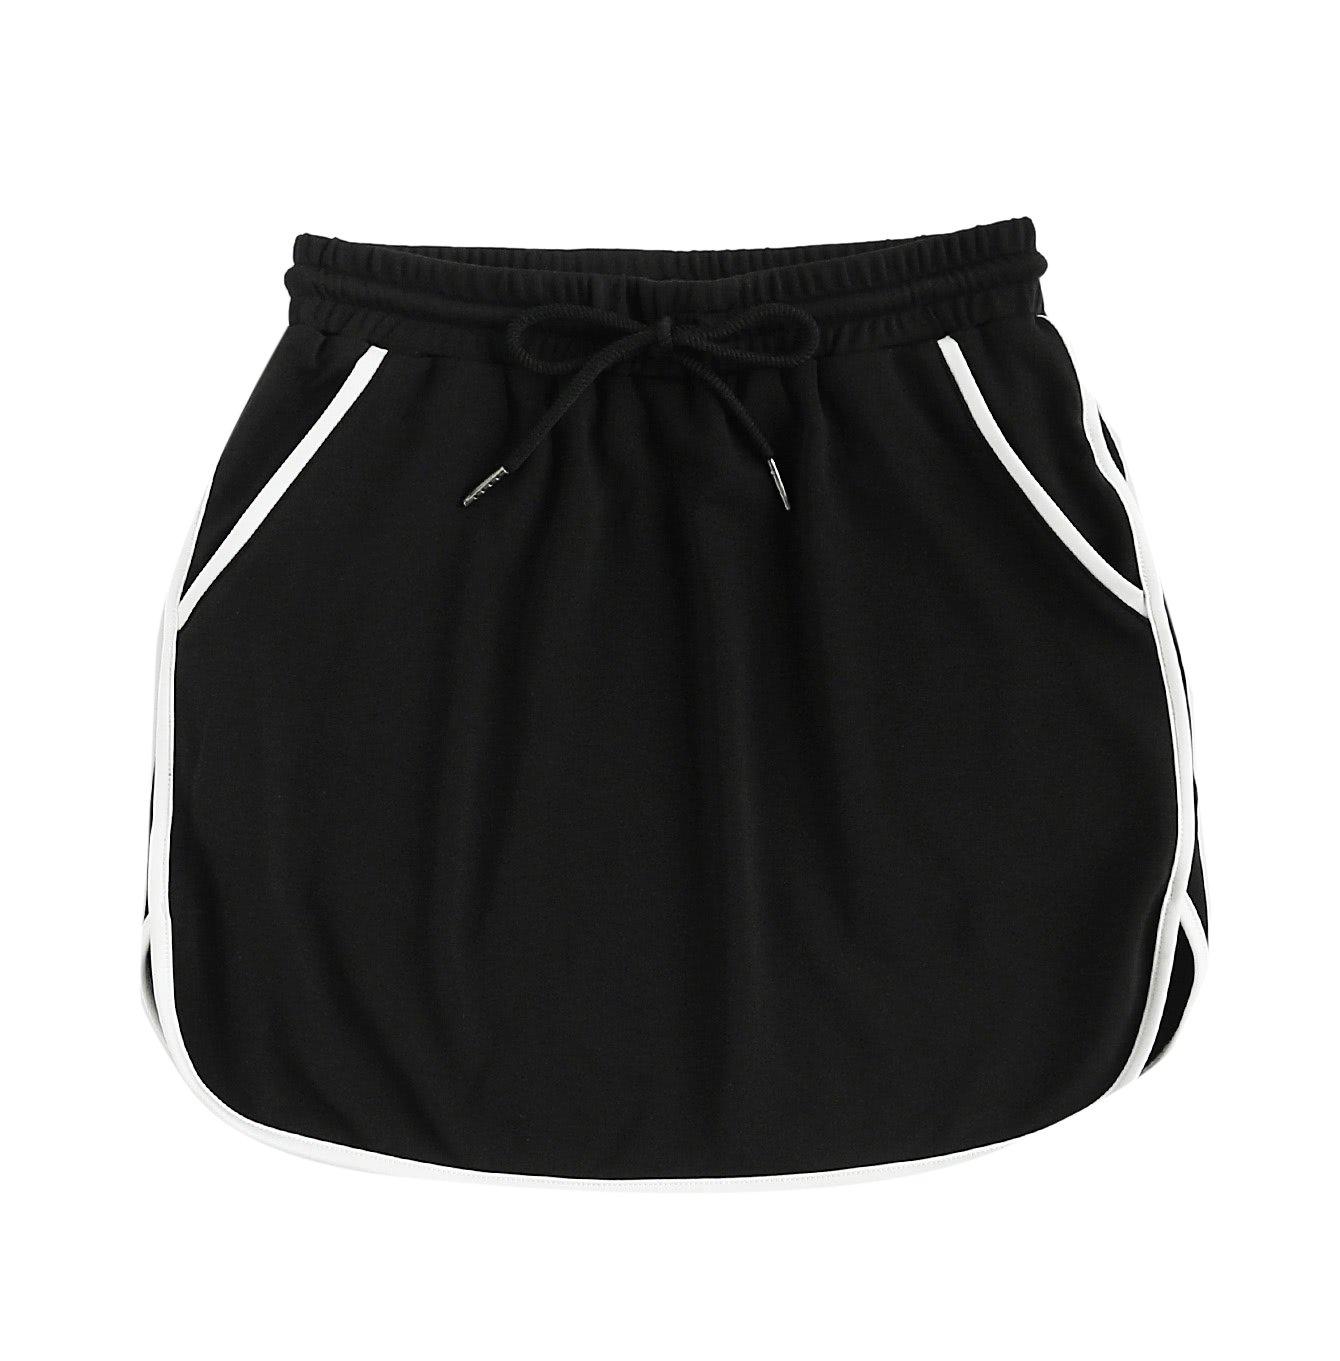 SweatyRocks Women's Summer Athletic Skirt with Drawstring Waist and Pockets Black XS